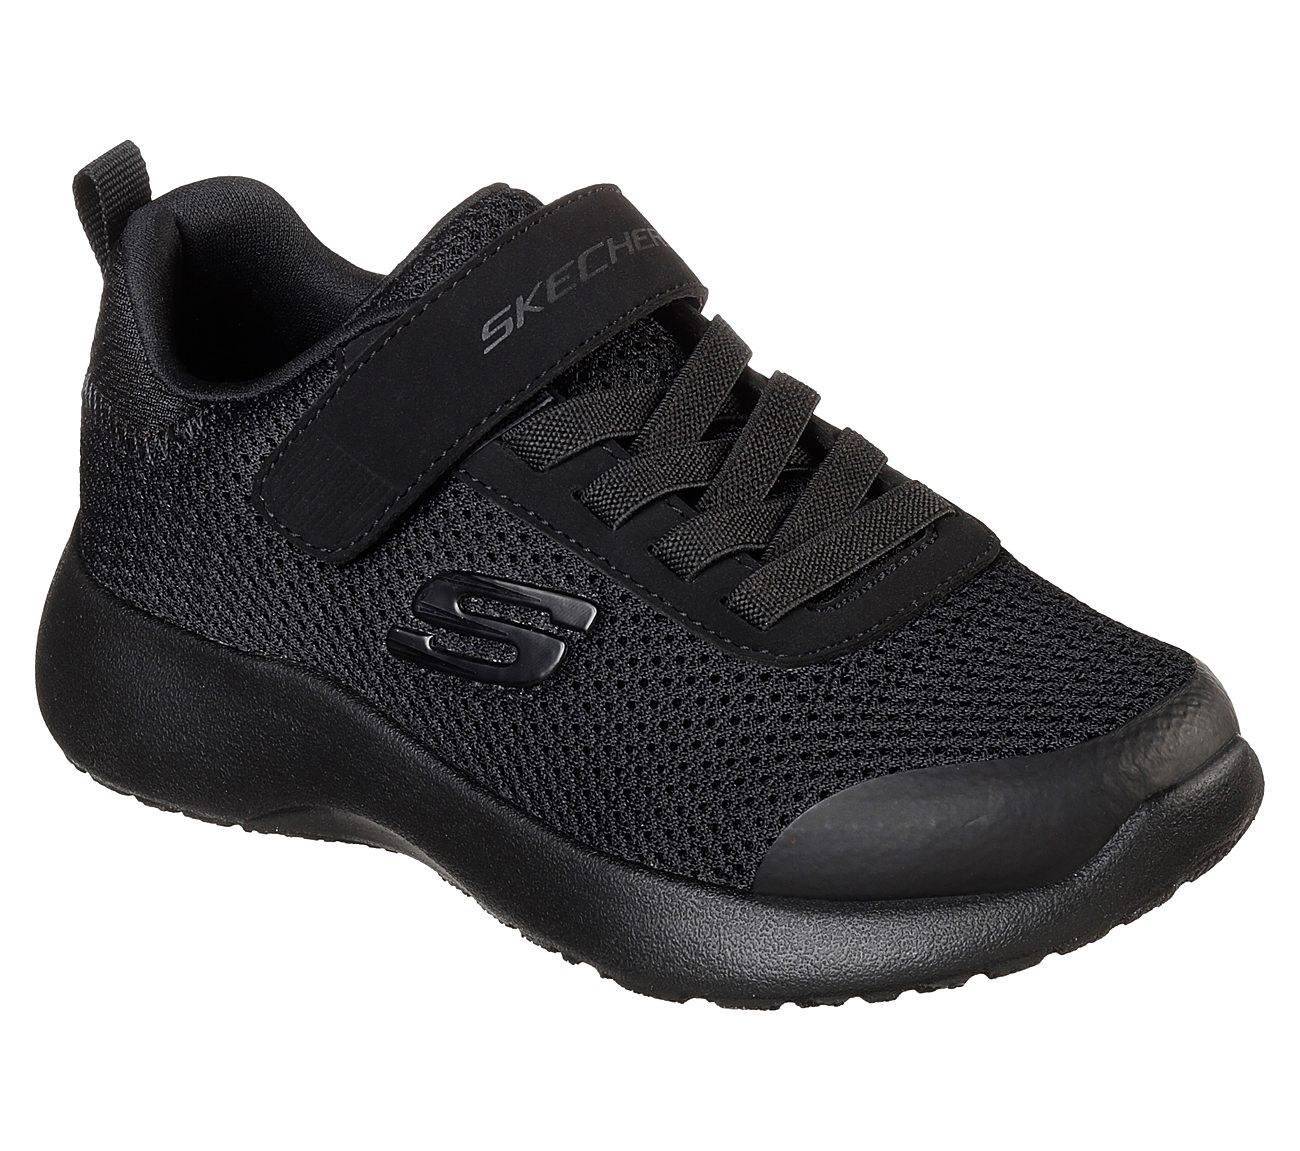 skechers school shoes nz